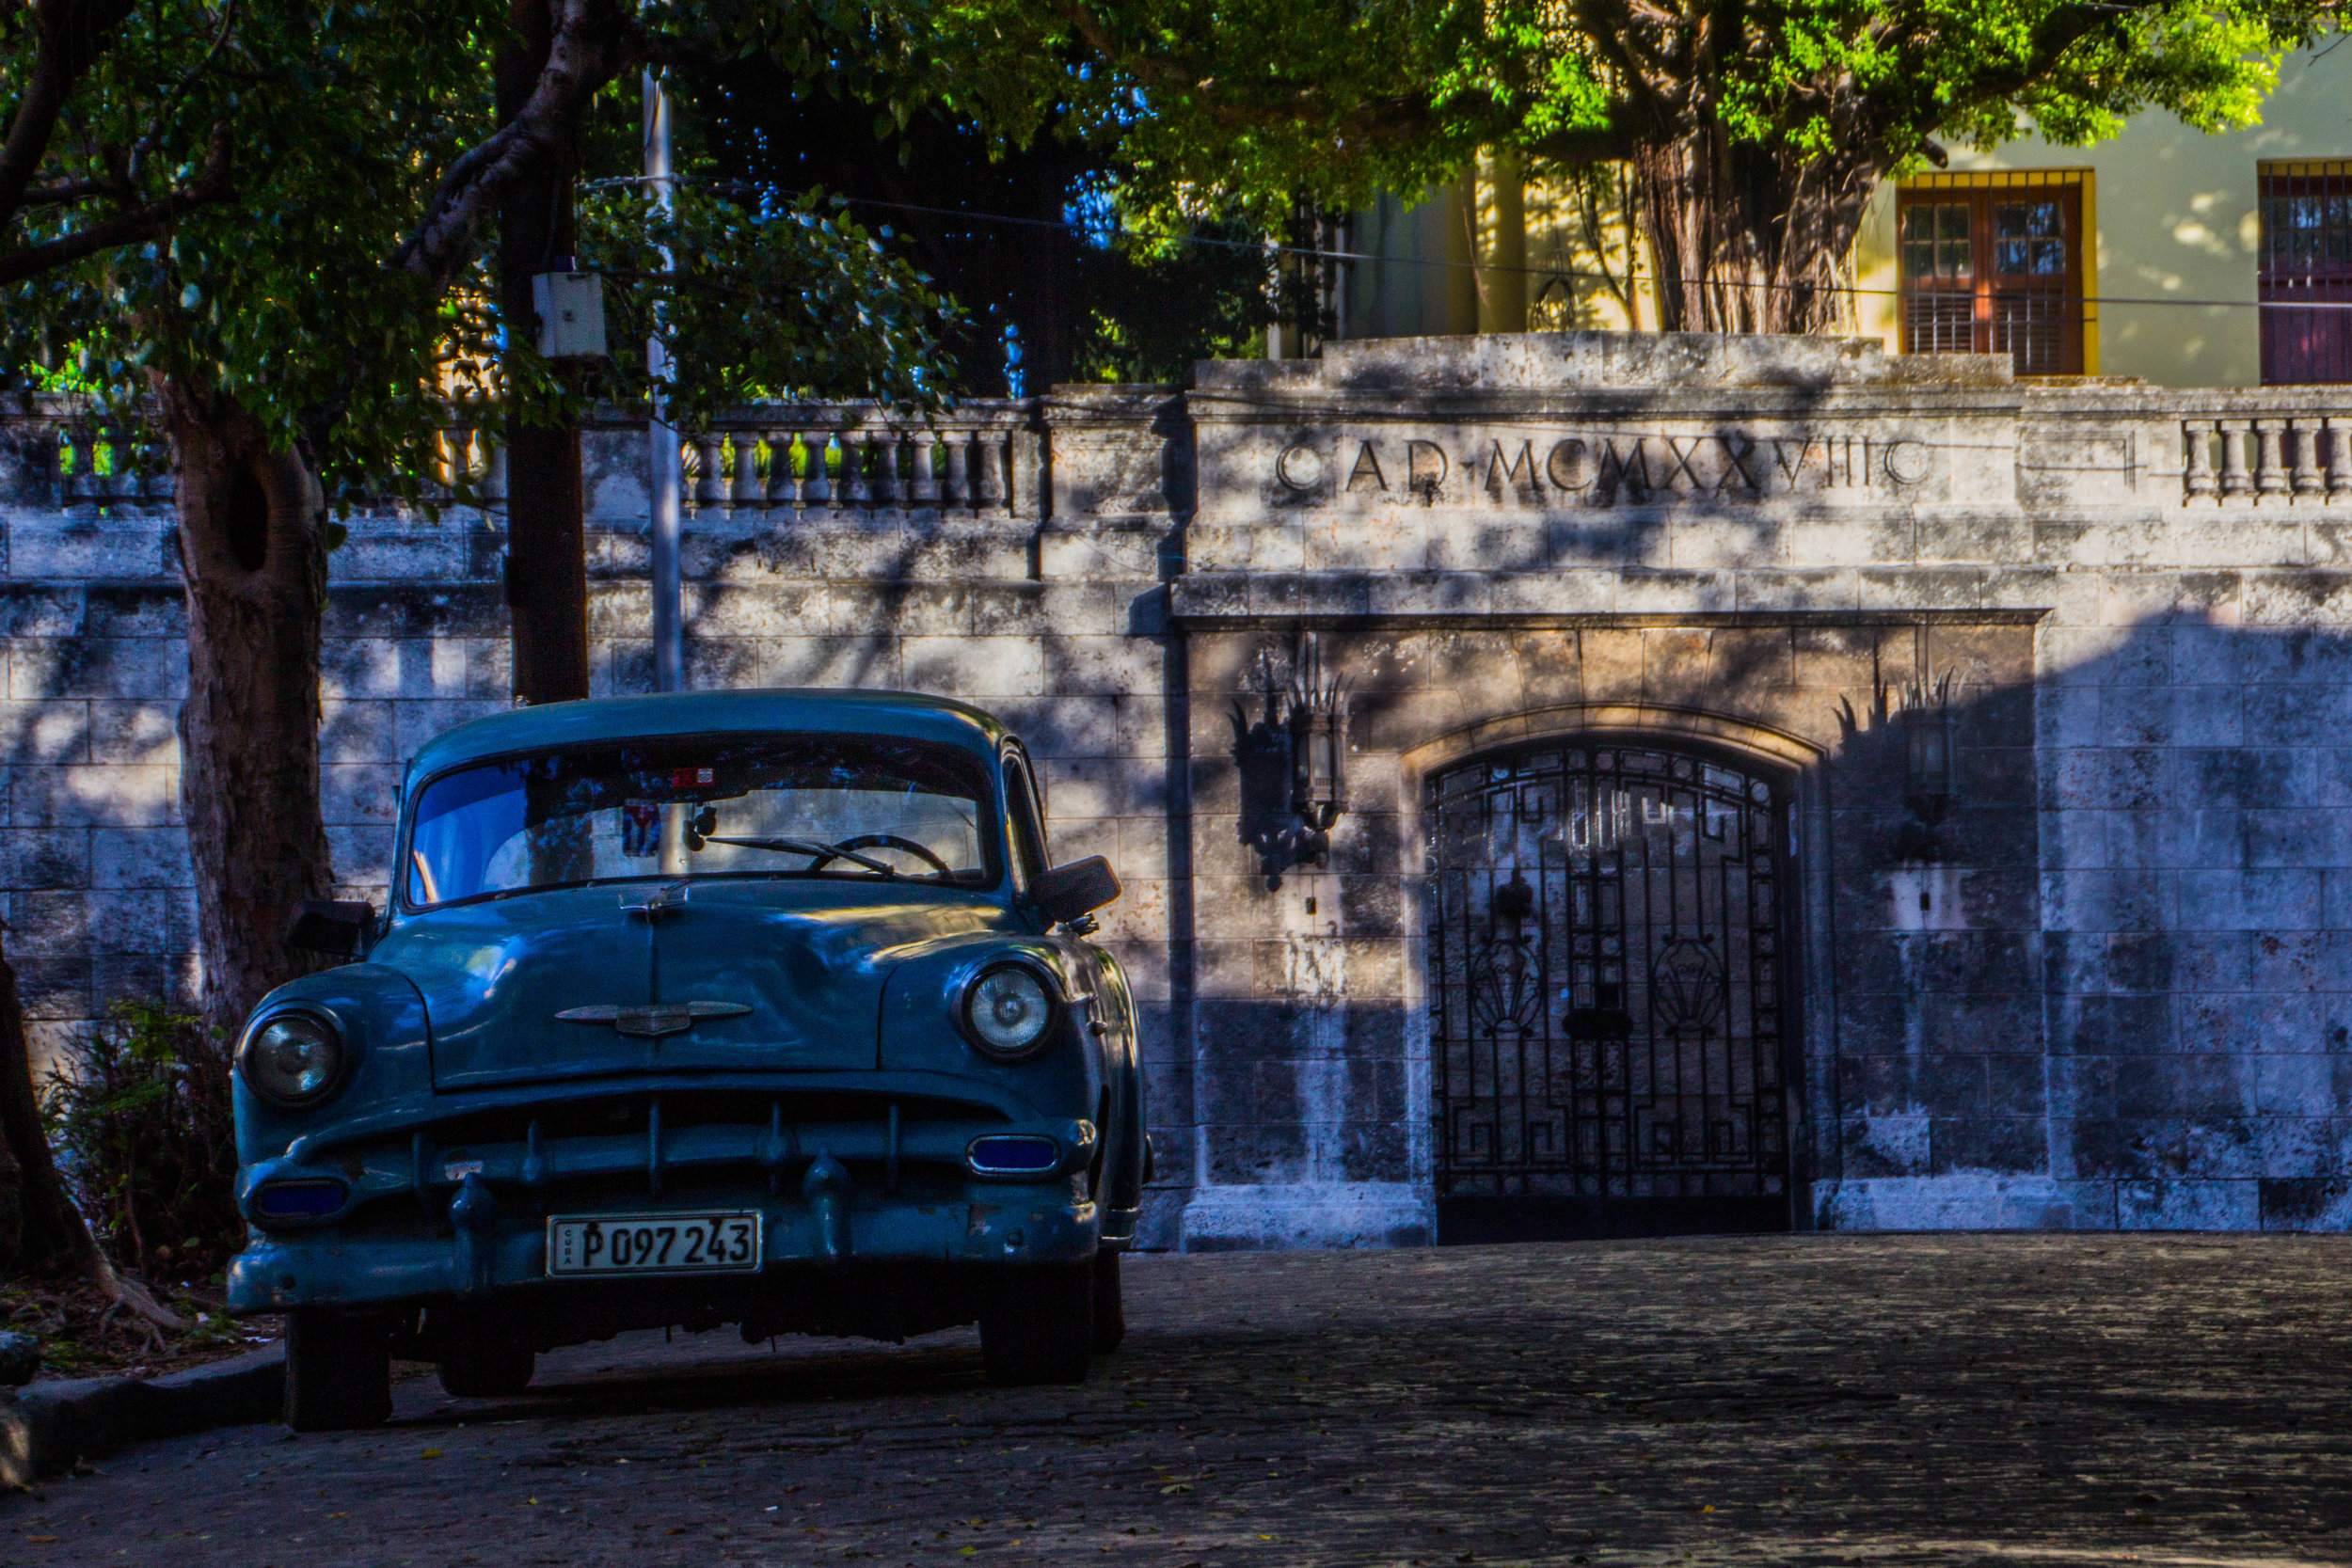 streets near university of havana vedado cuba-1-3.jpg